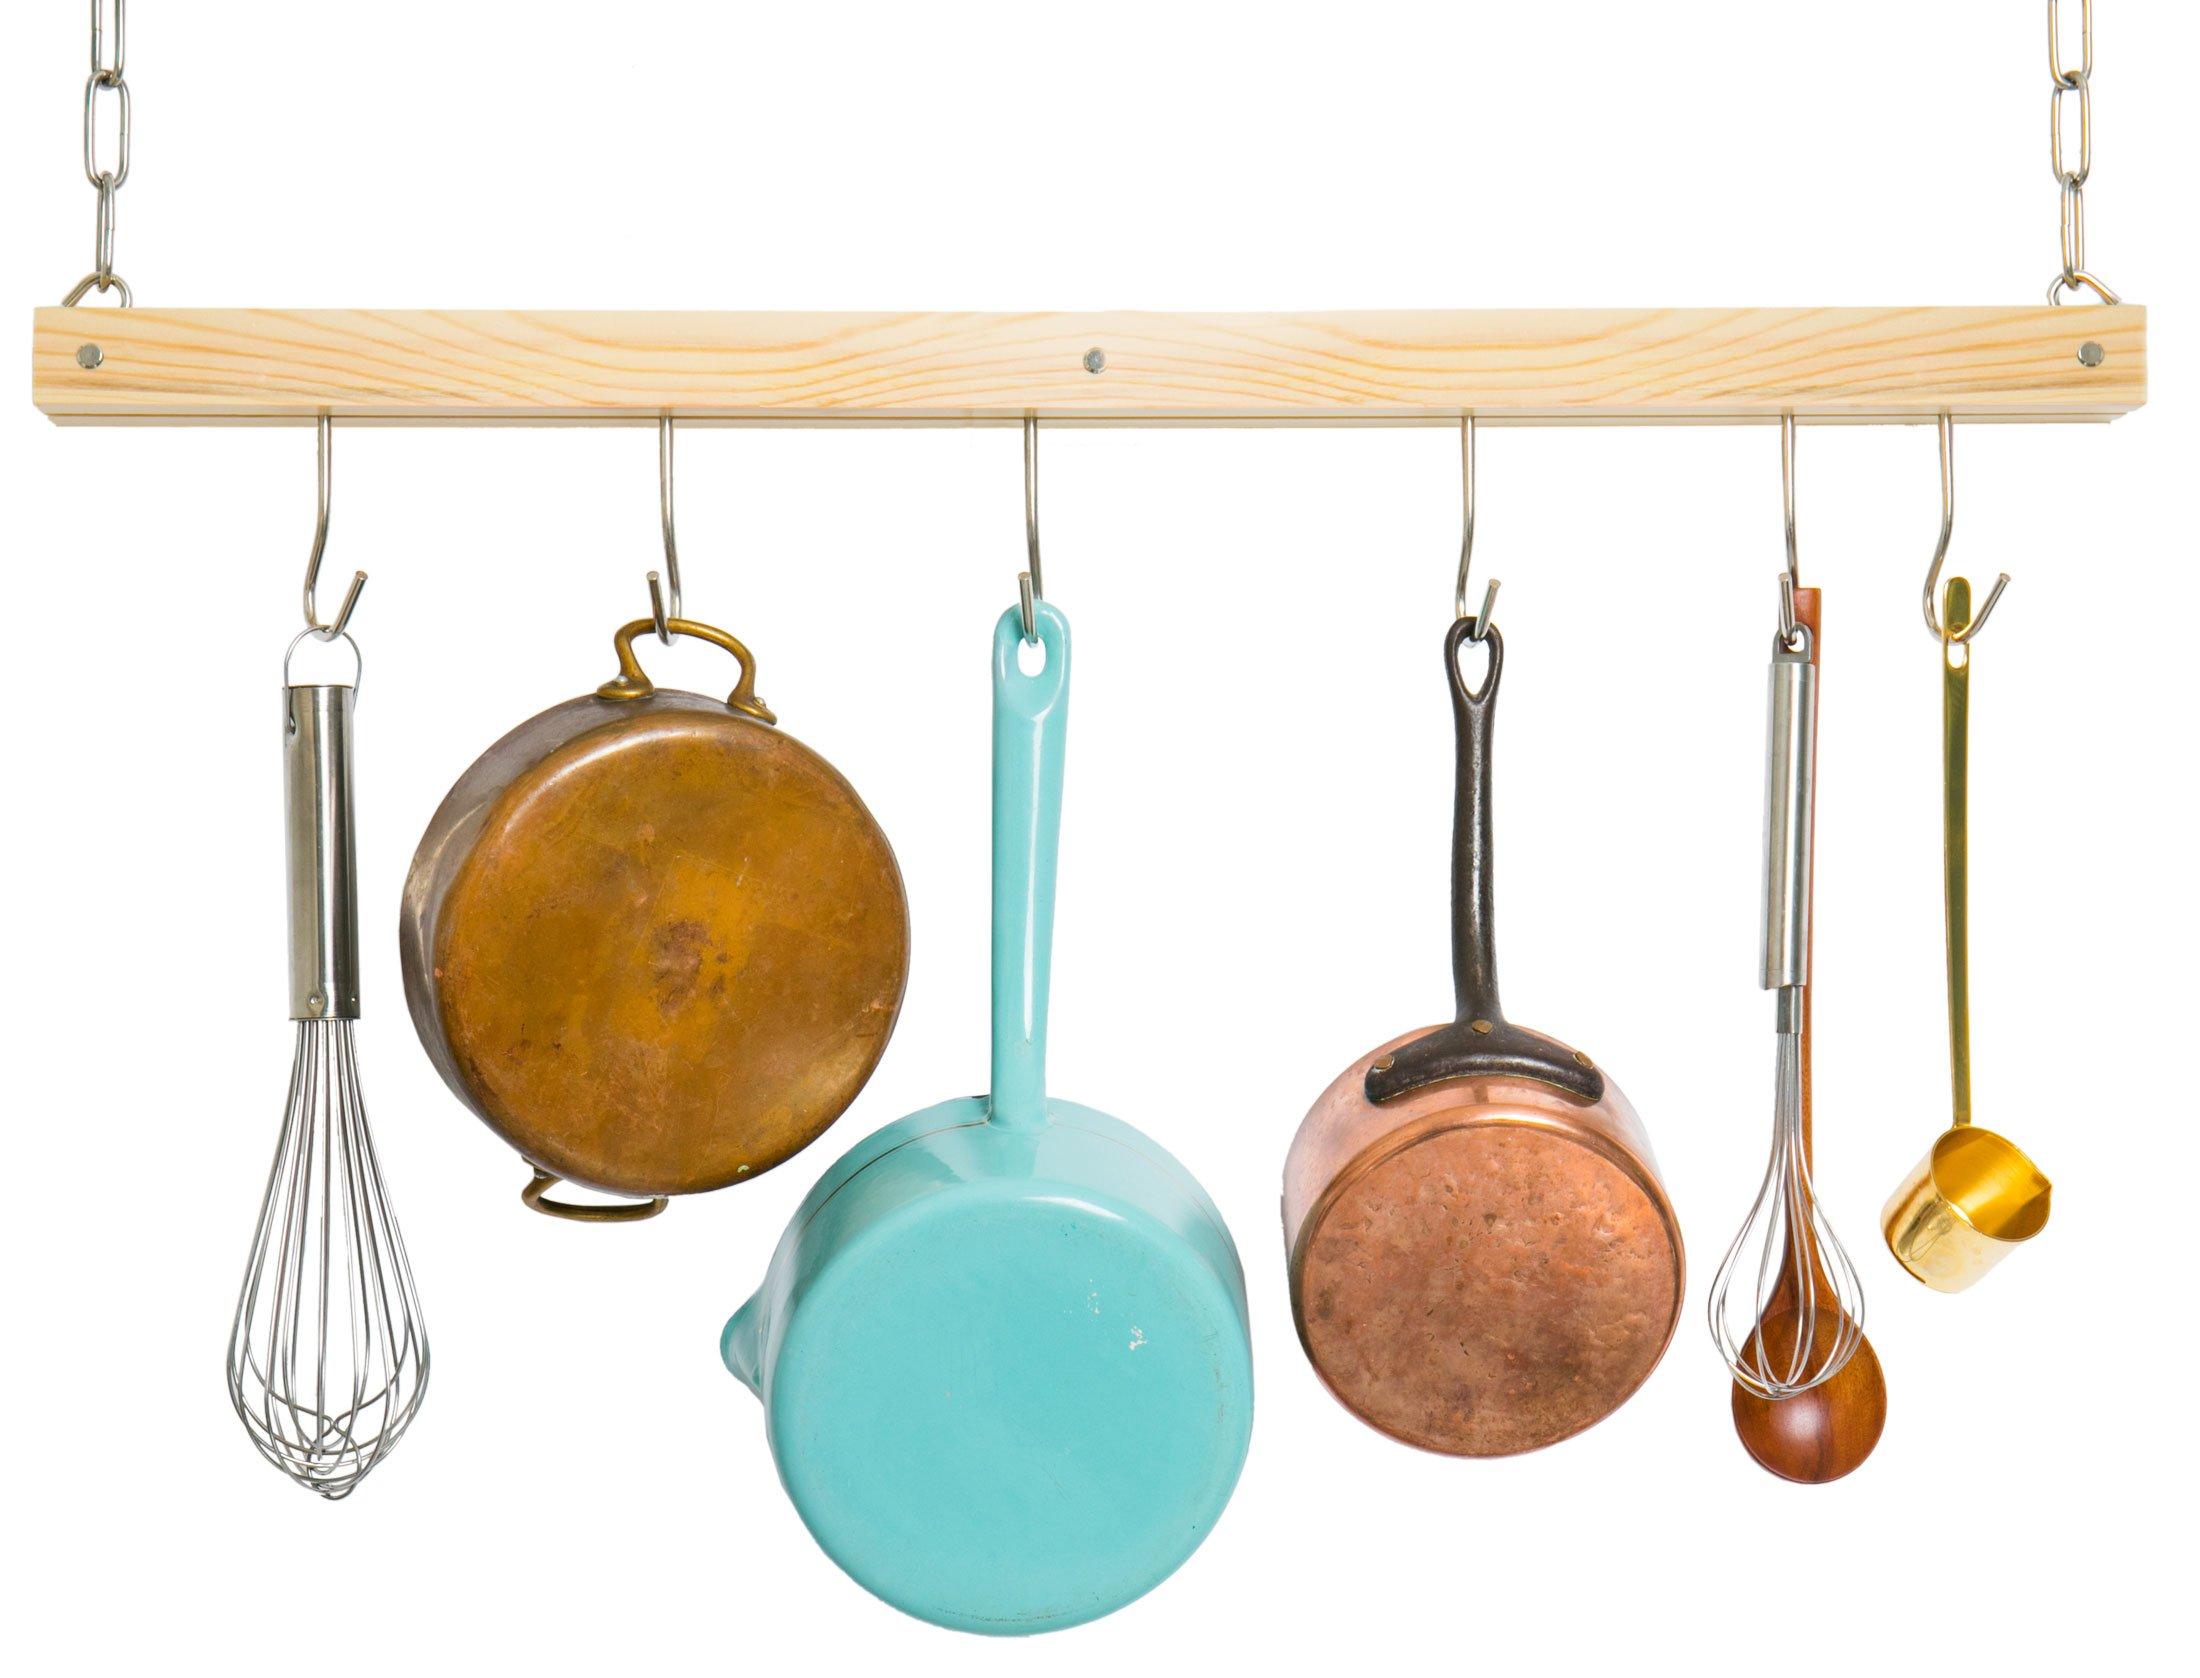 JackCubeDesign Ceiling Wood Pot Rack Hanging Pan Organizer Hanger Kitchen Storage Single Bar Utensil Houseware Holder with 6 Hooks(30-Inch) – MK396A